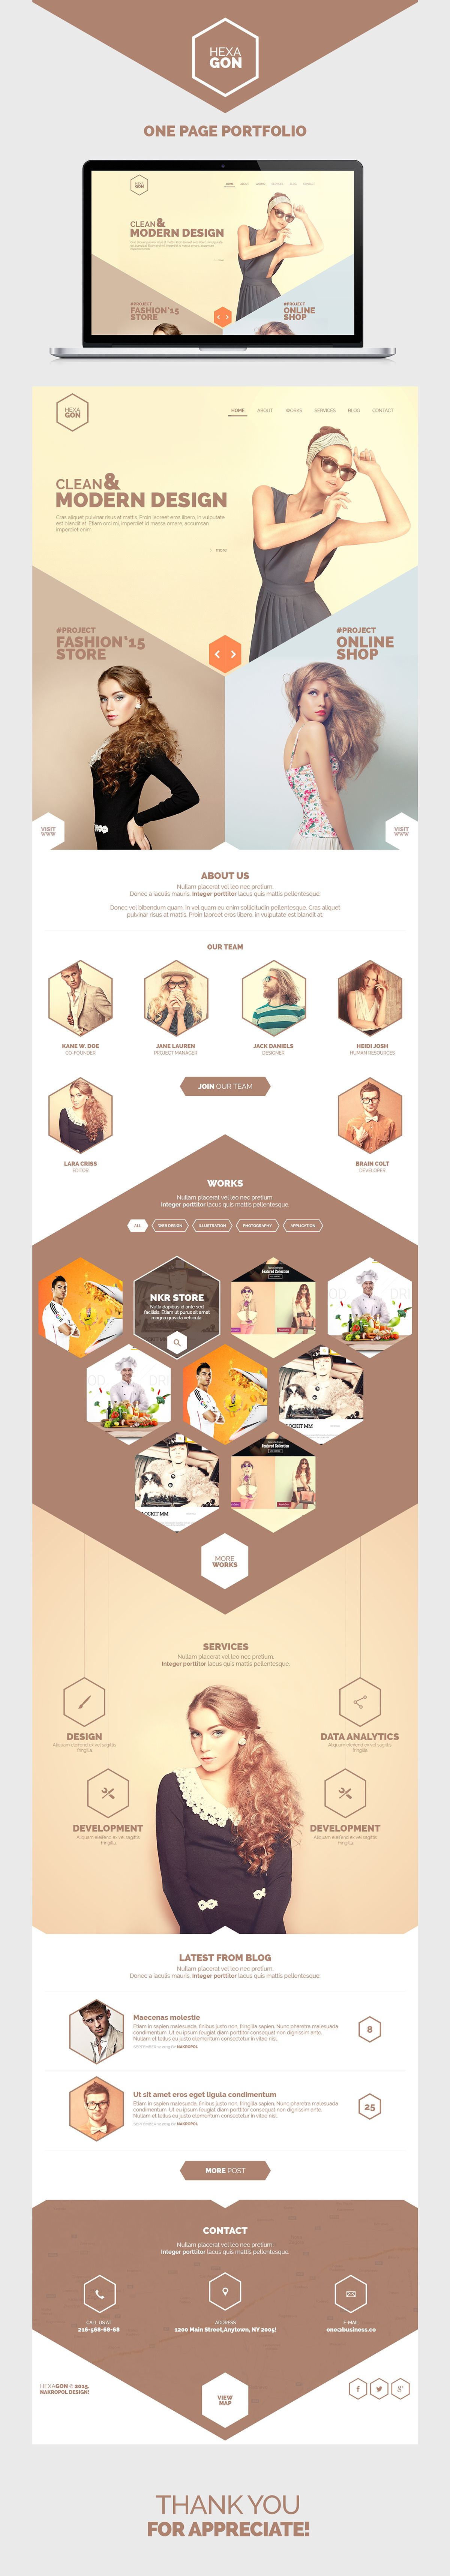 Hexagon - One Page Portfolio (Free PSD) on Behance